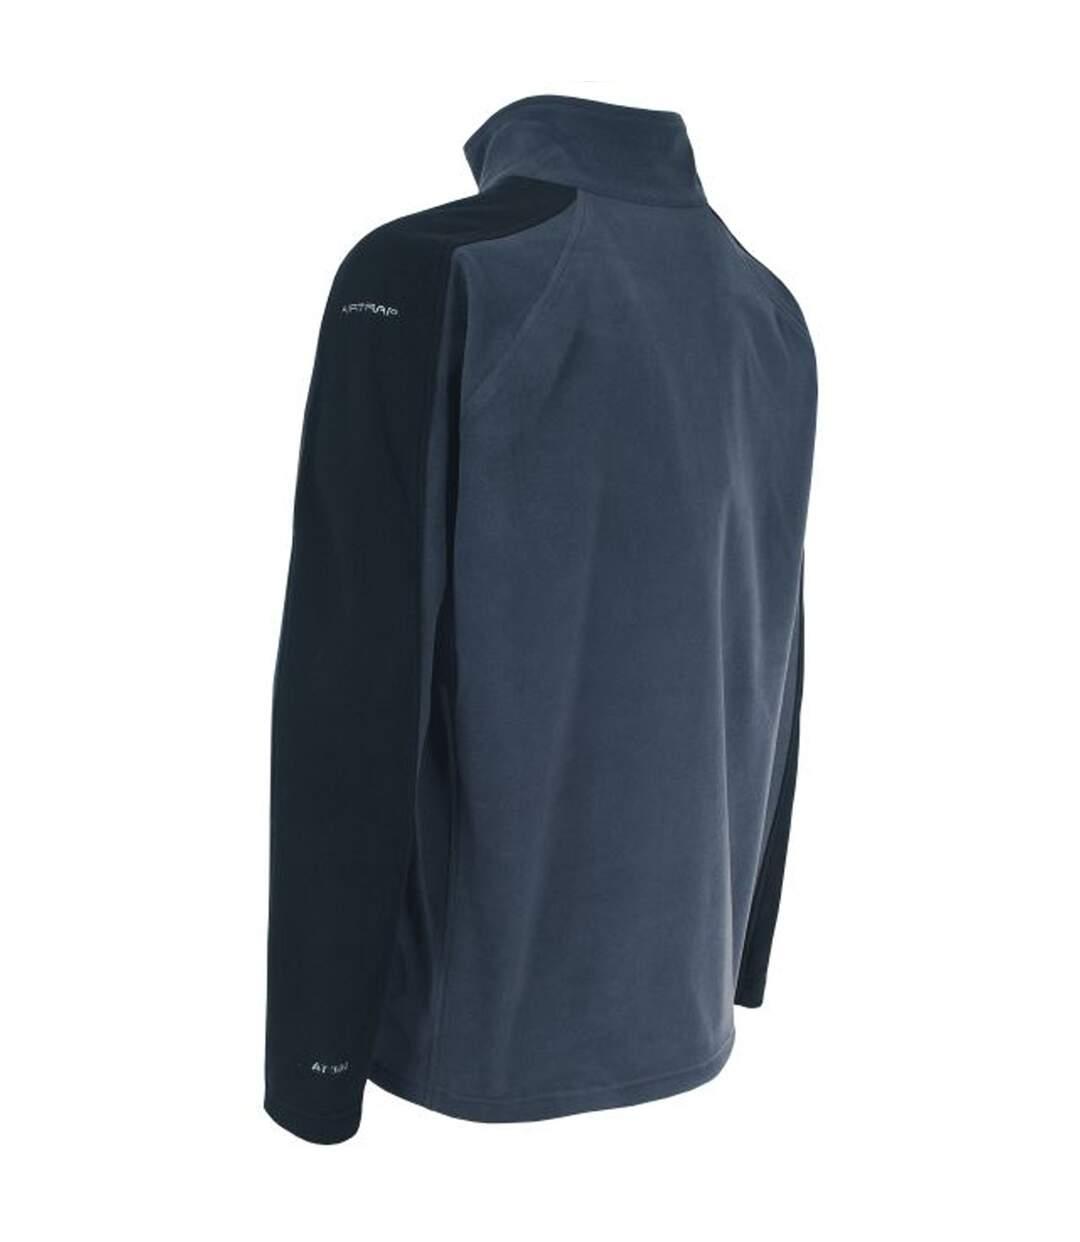 Trespass Mens Acres Full Zip Fleece Jacket (Bright Blue) - UTTP253